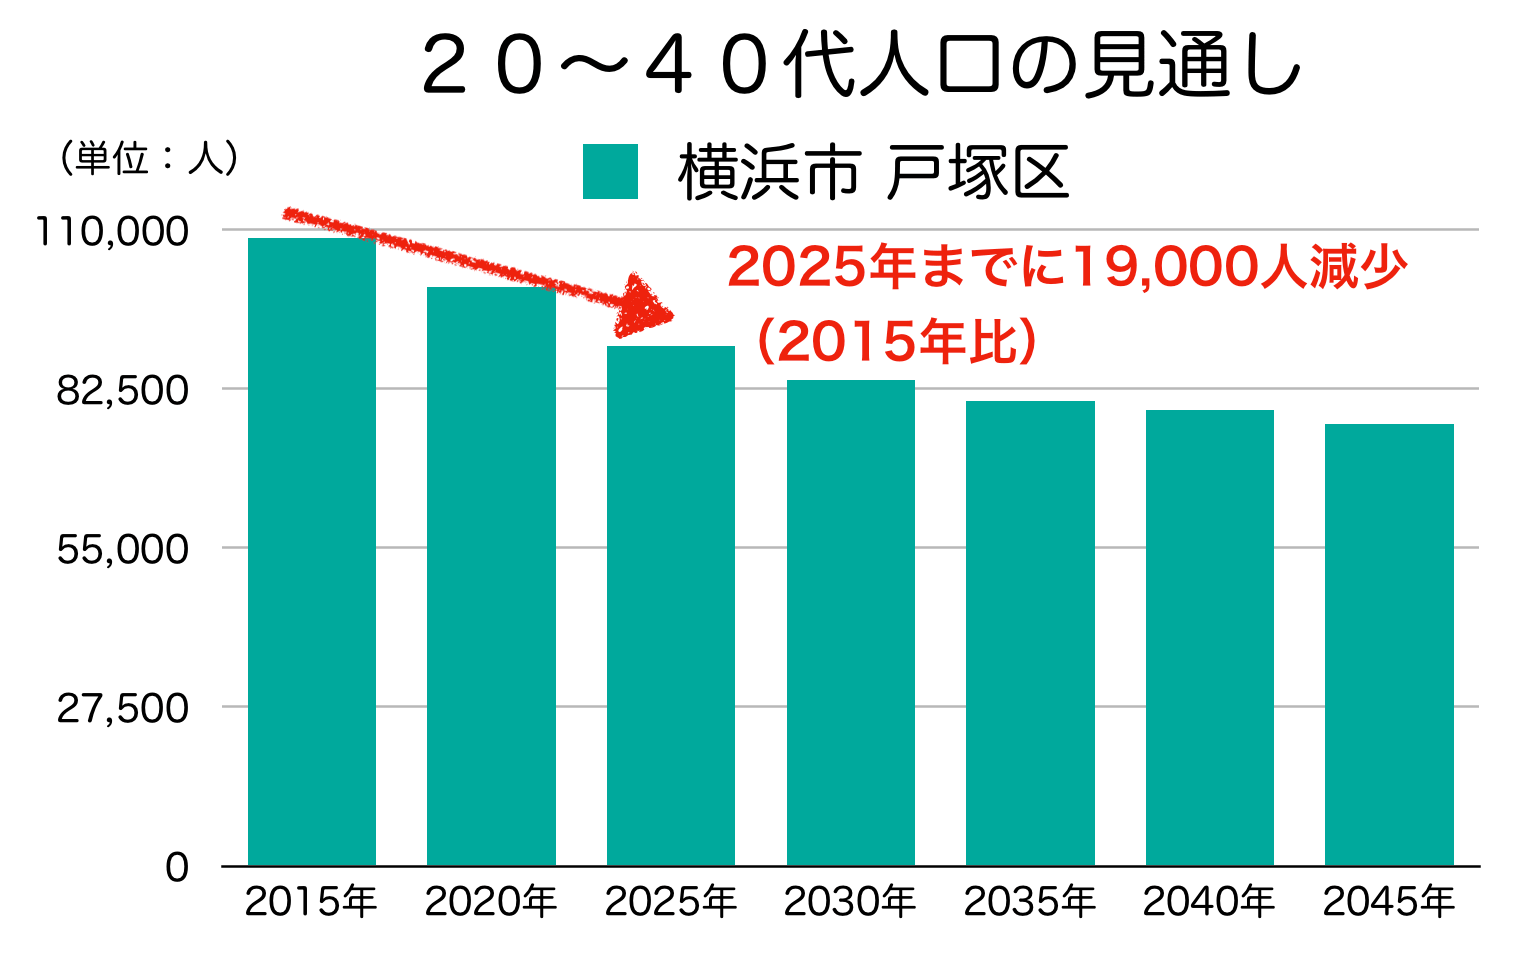 横浜市戸塚区の20〜40代人口の予測